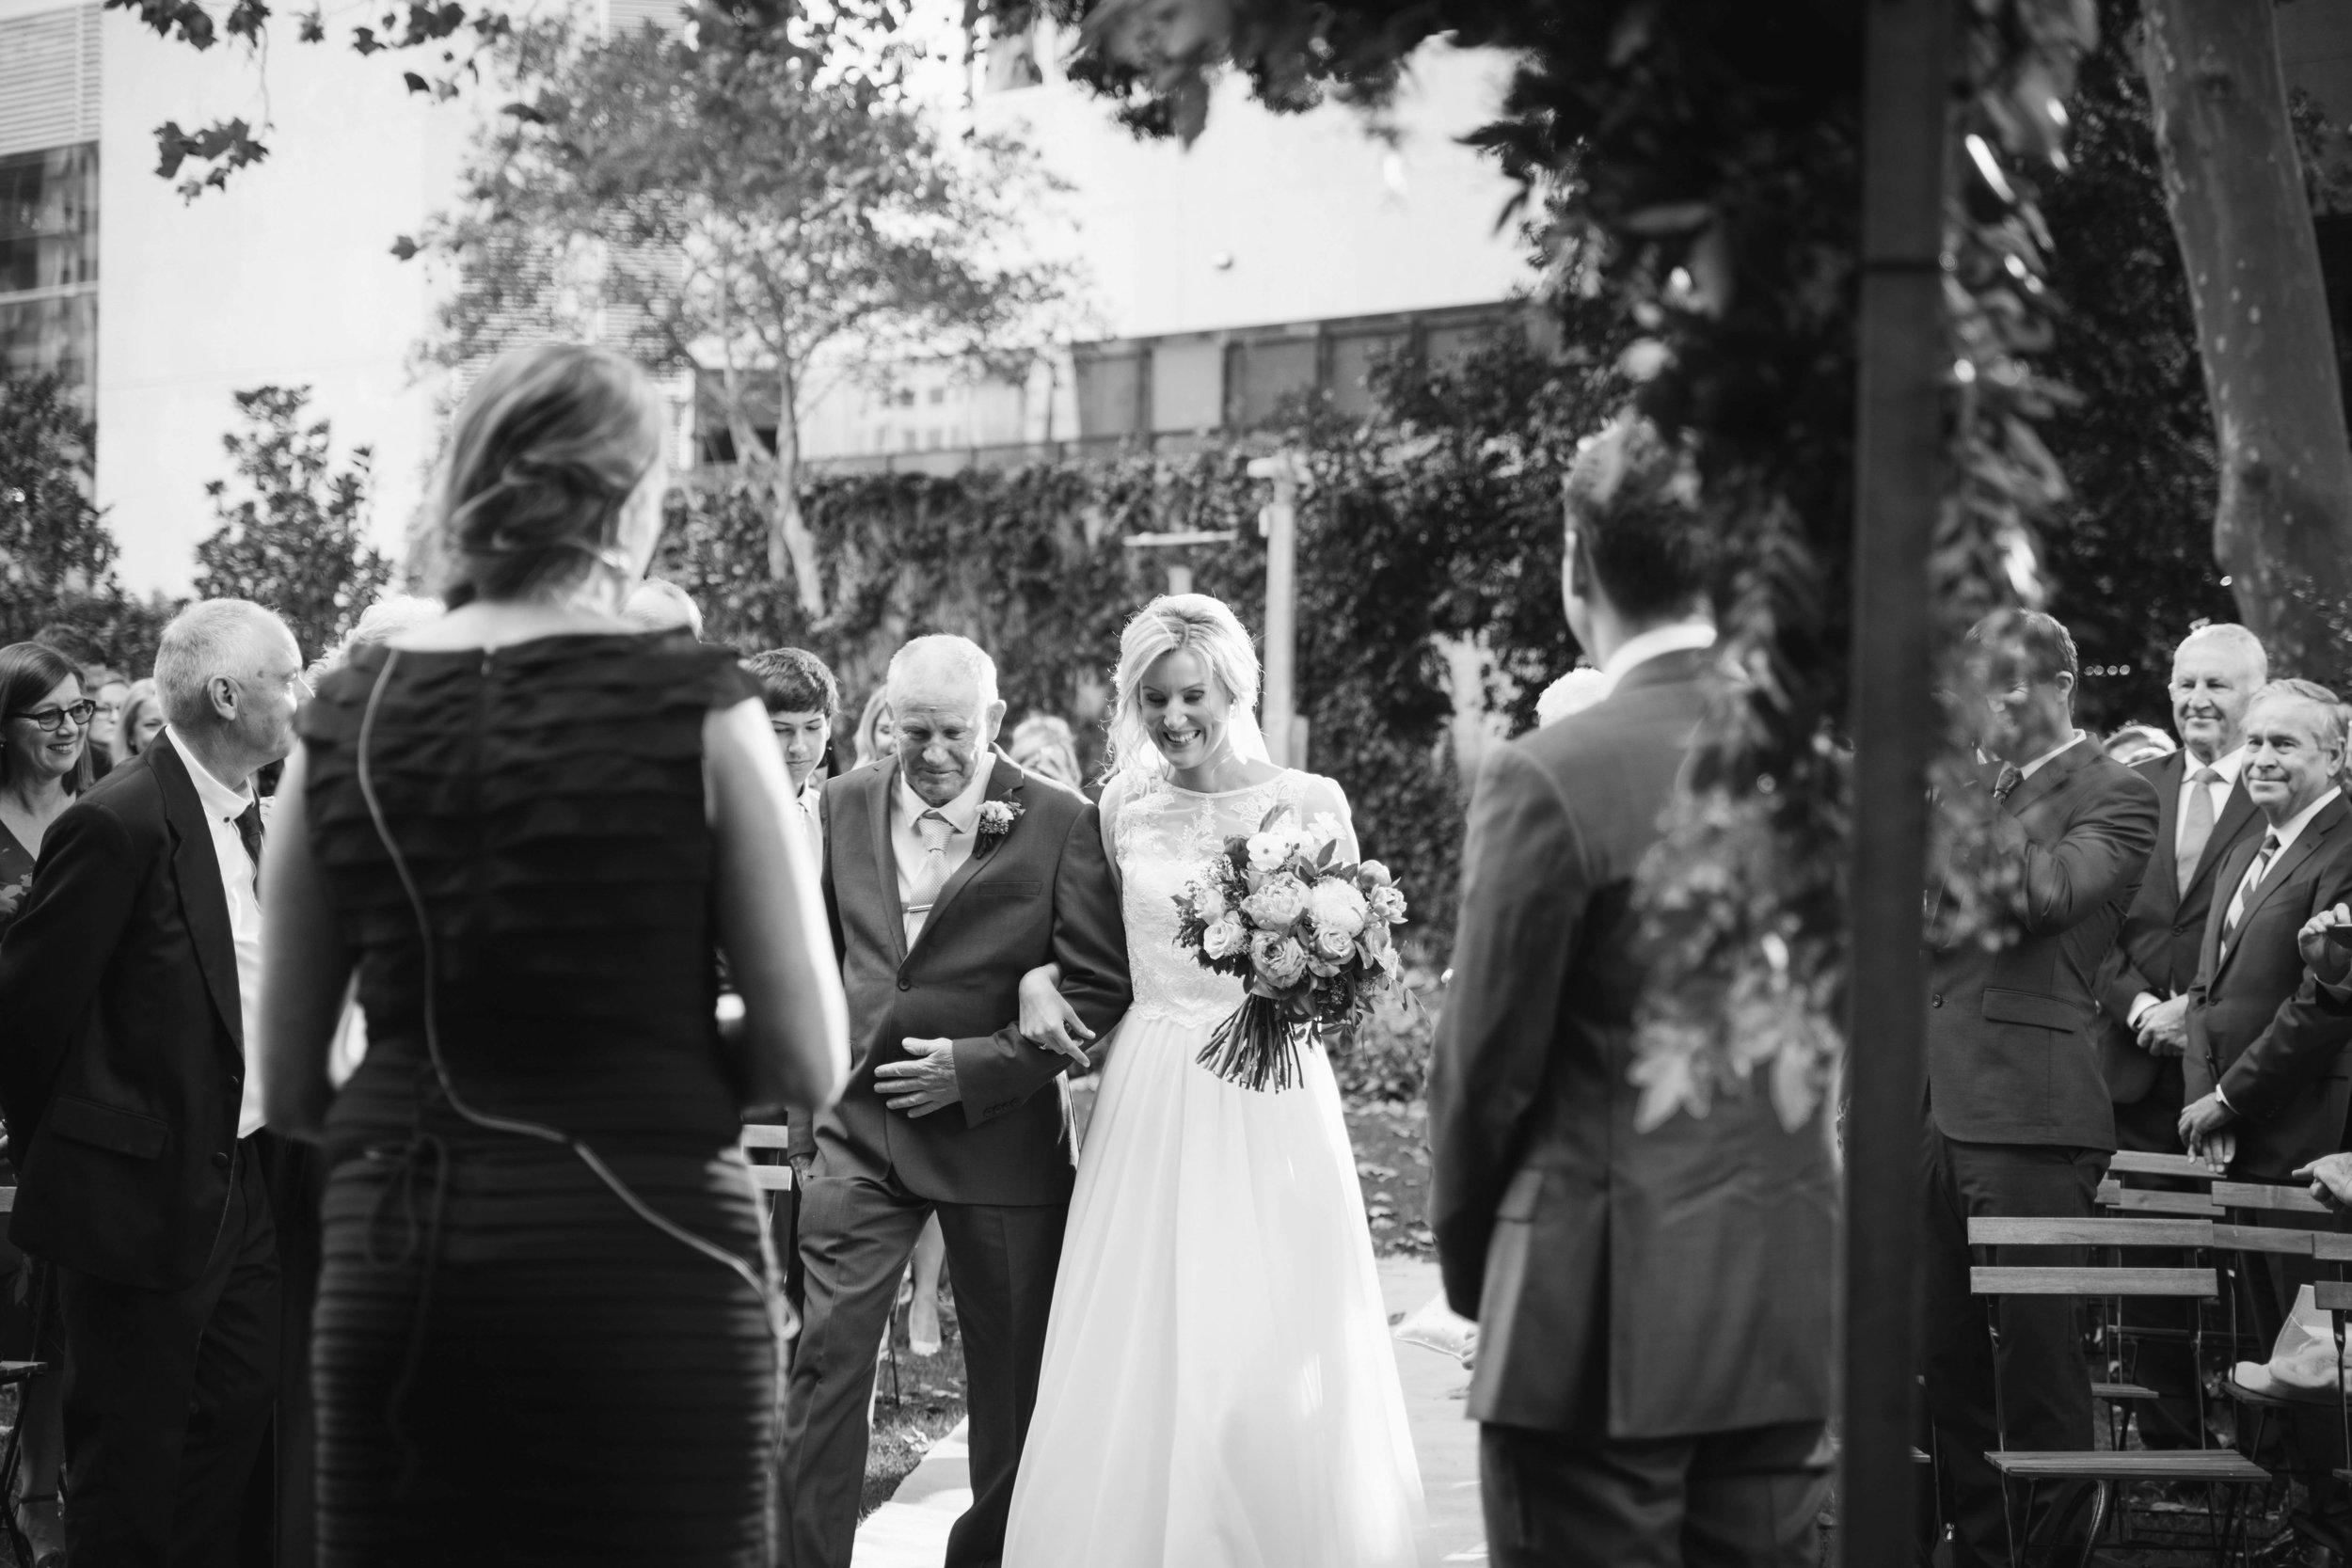 Lamonts Bishops House City Urban Perth Wheatbelt Avon Valley Wedding Photographer Photography (10).jpg